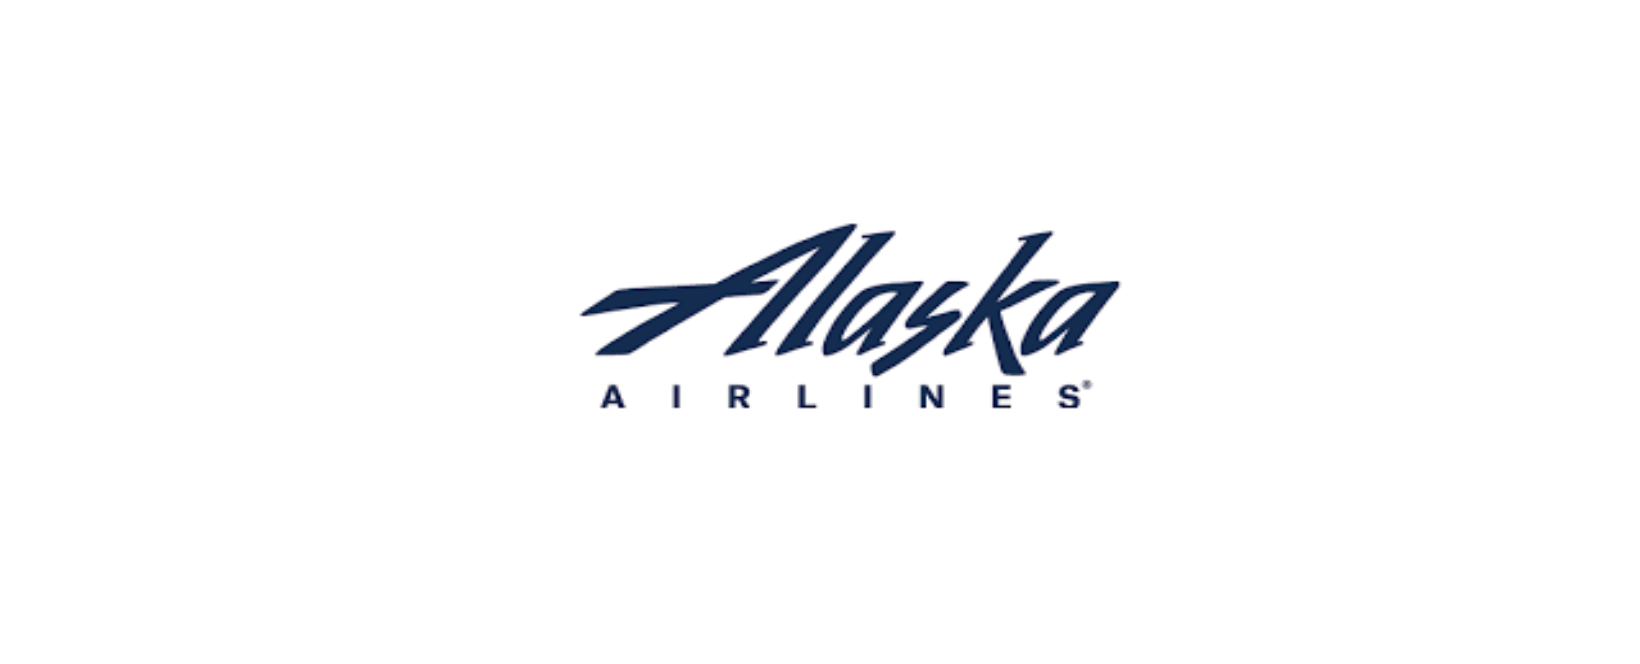 Alaska Airlines Discount Code 2021